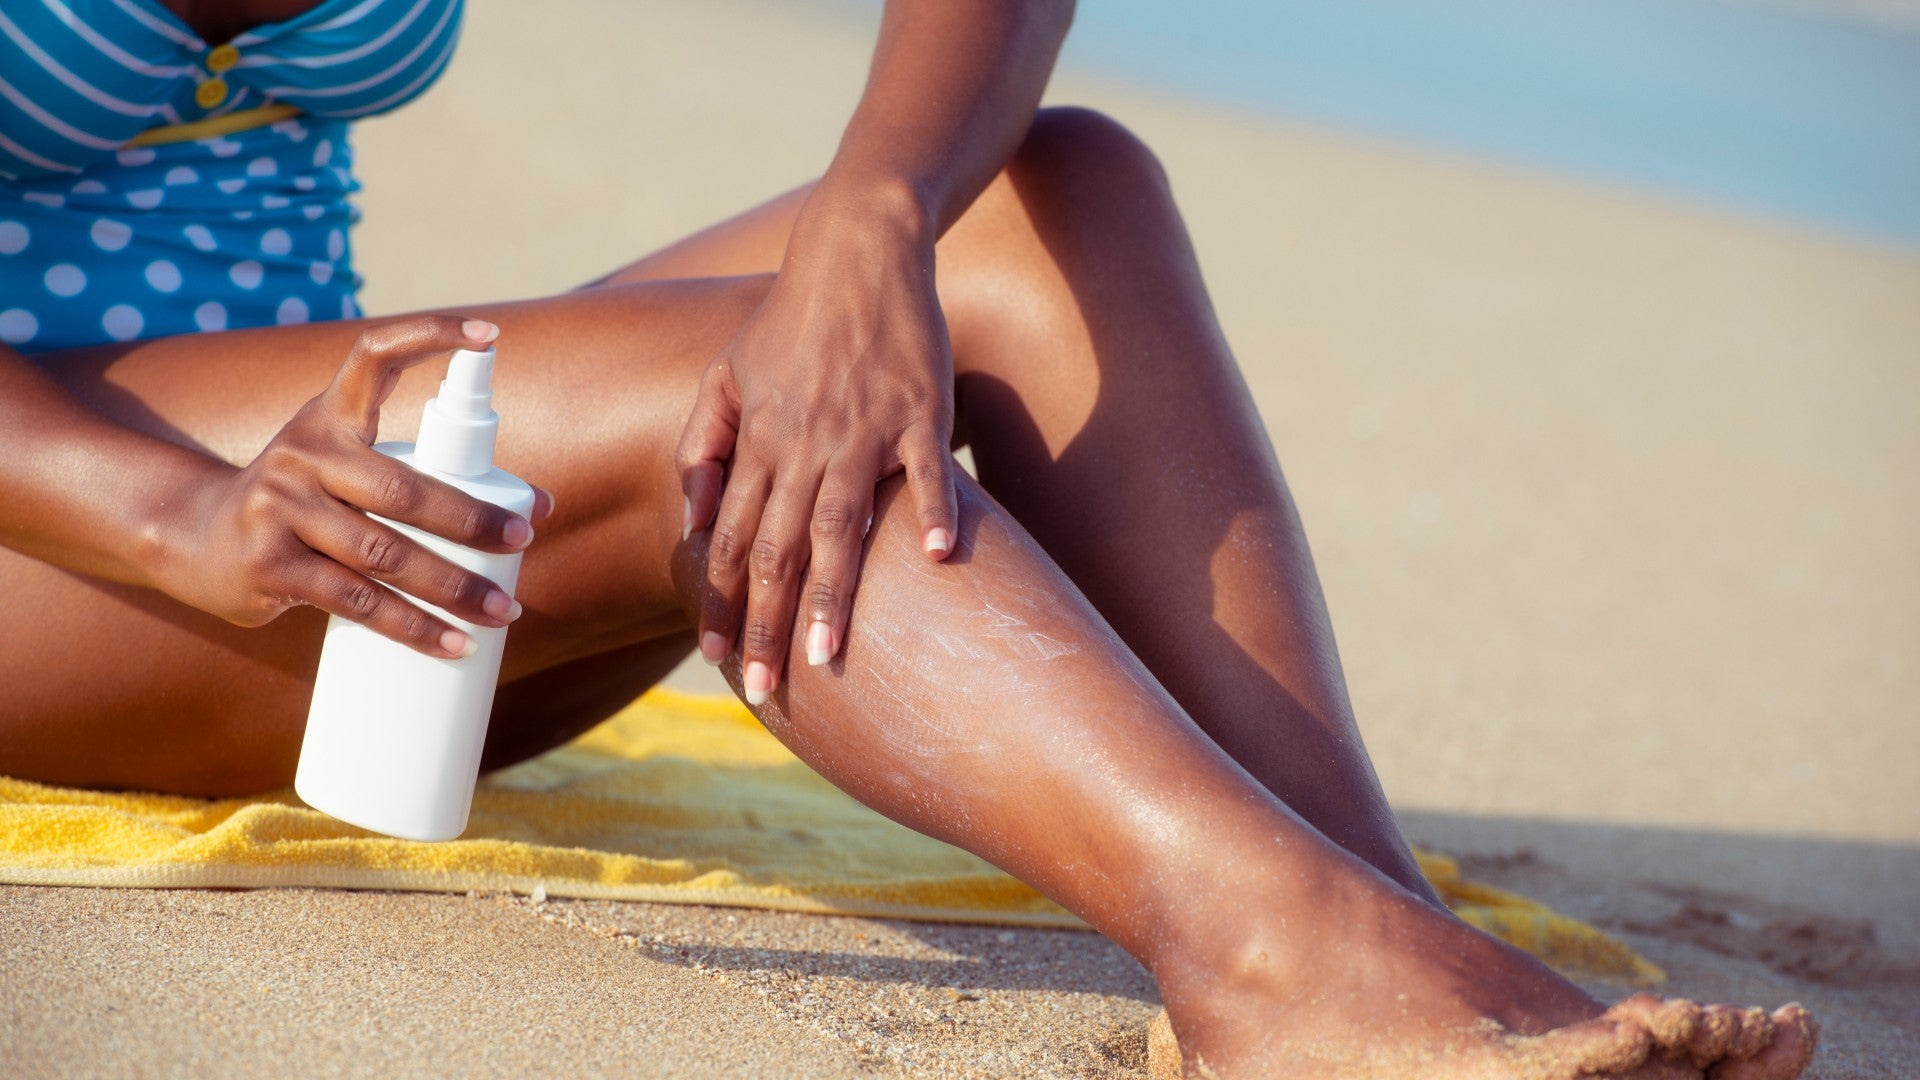 A Dermatologist Shares Top Tips  For Treating Sunburn